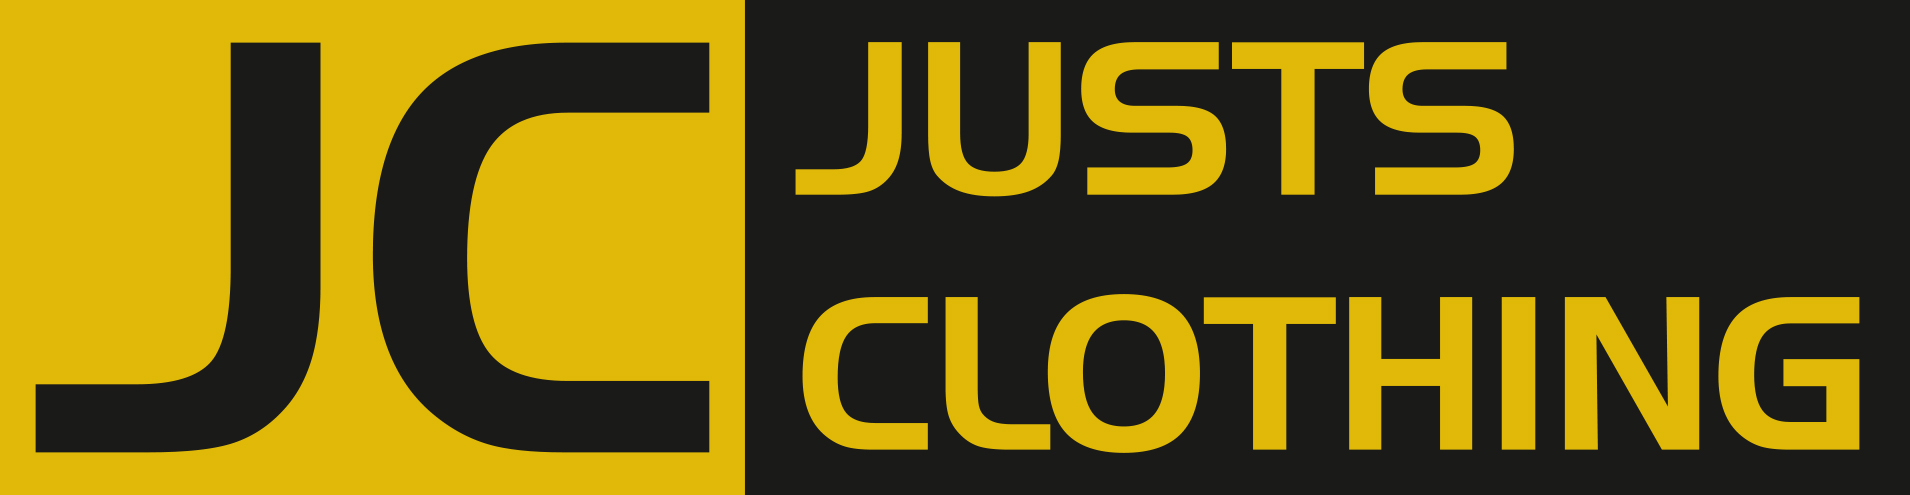 Justs_Clothing_Logo